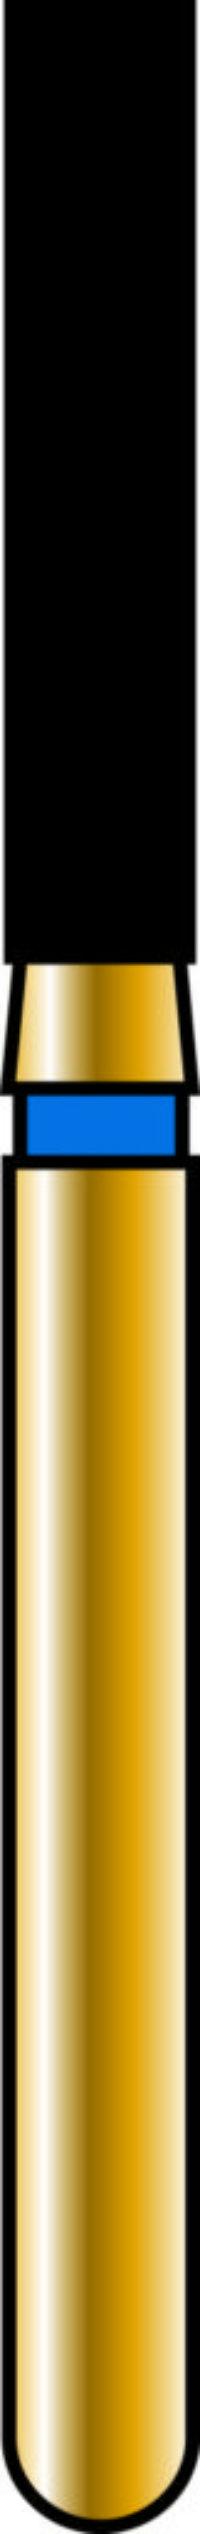 Flat End Cylinder 16-8mm Gold Diamond Bur